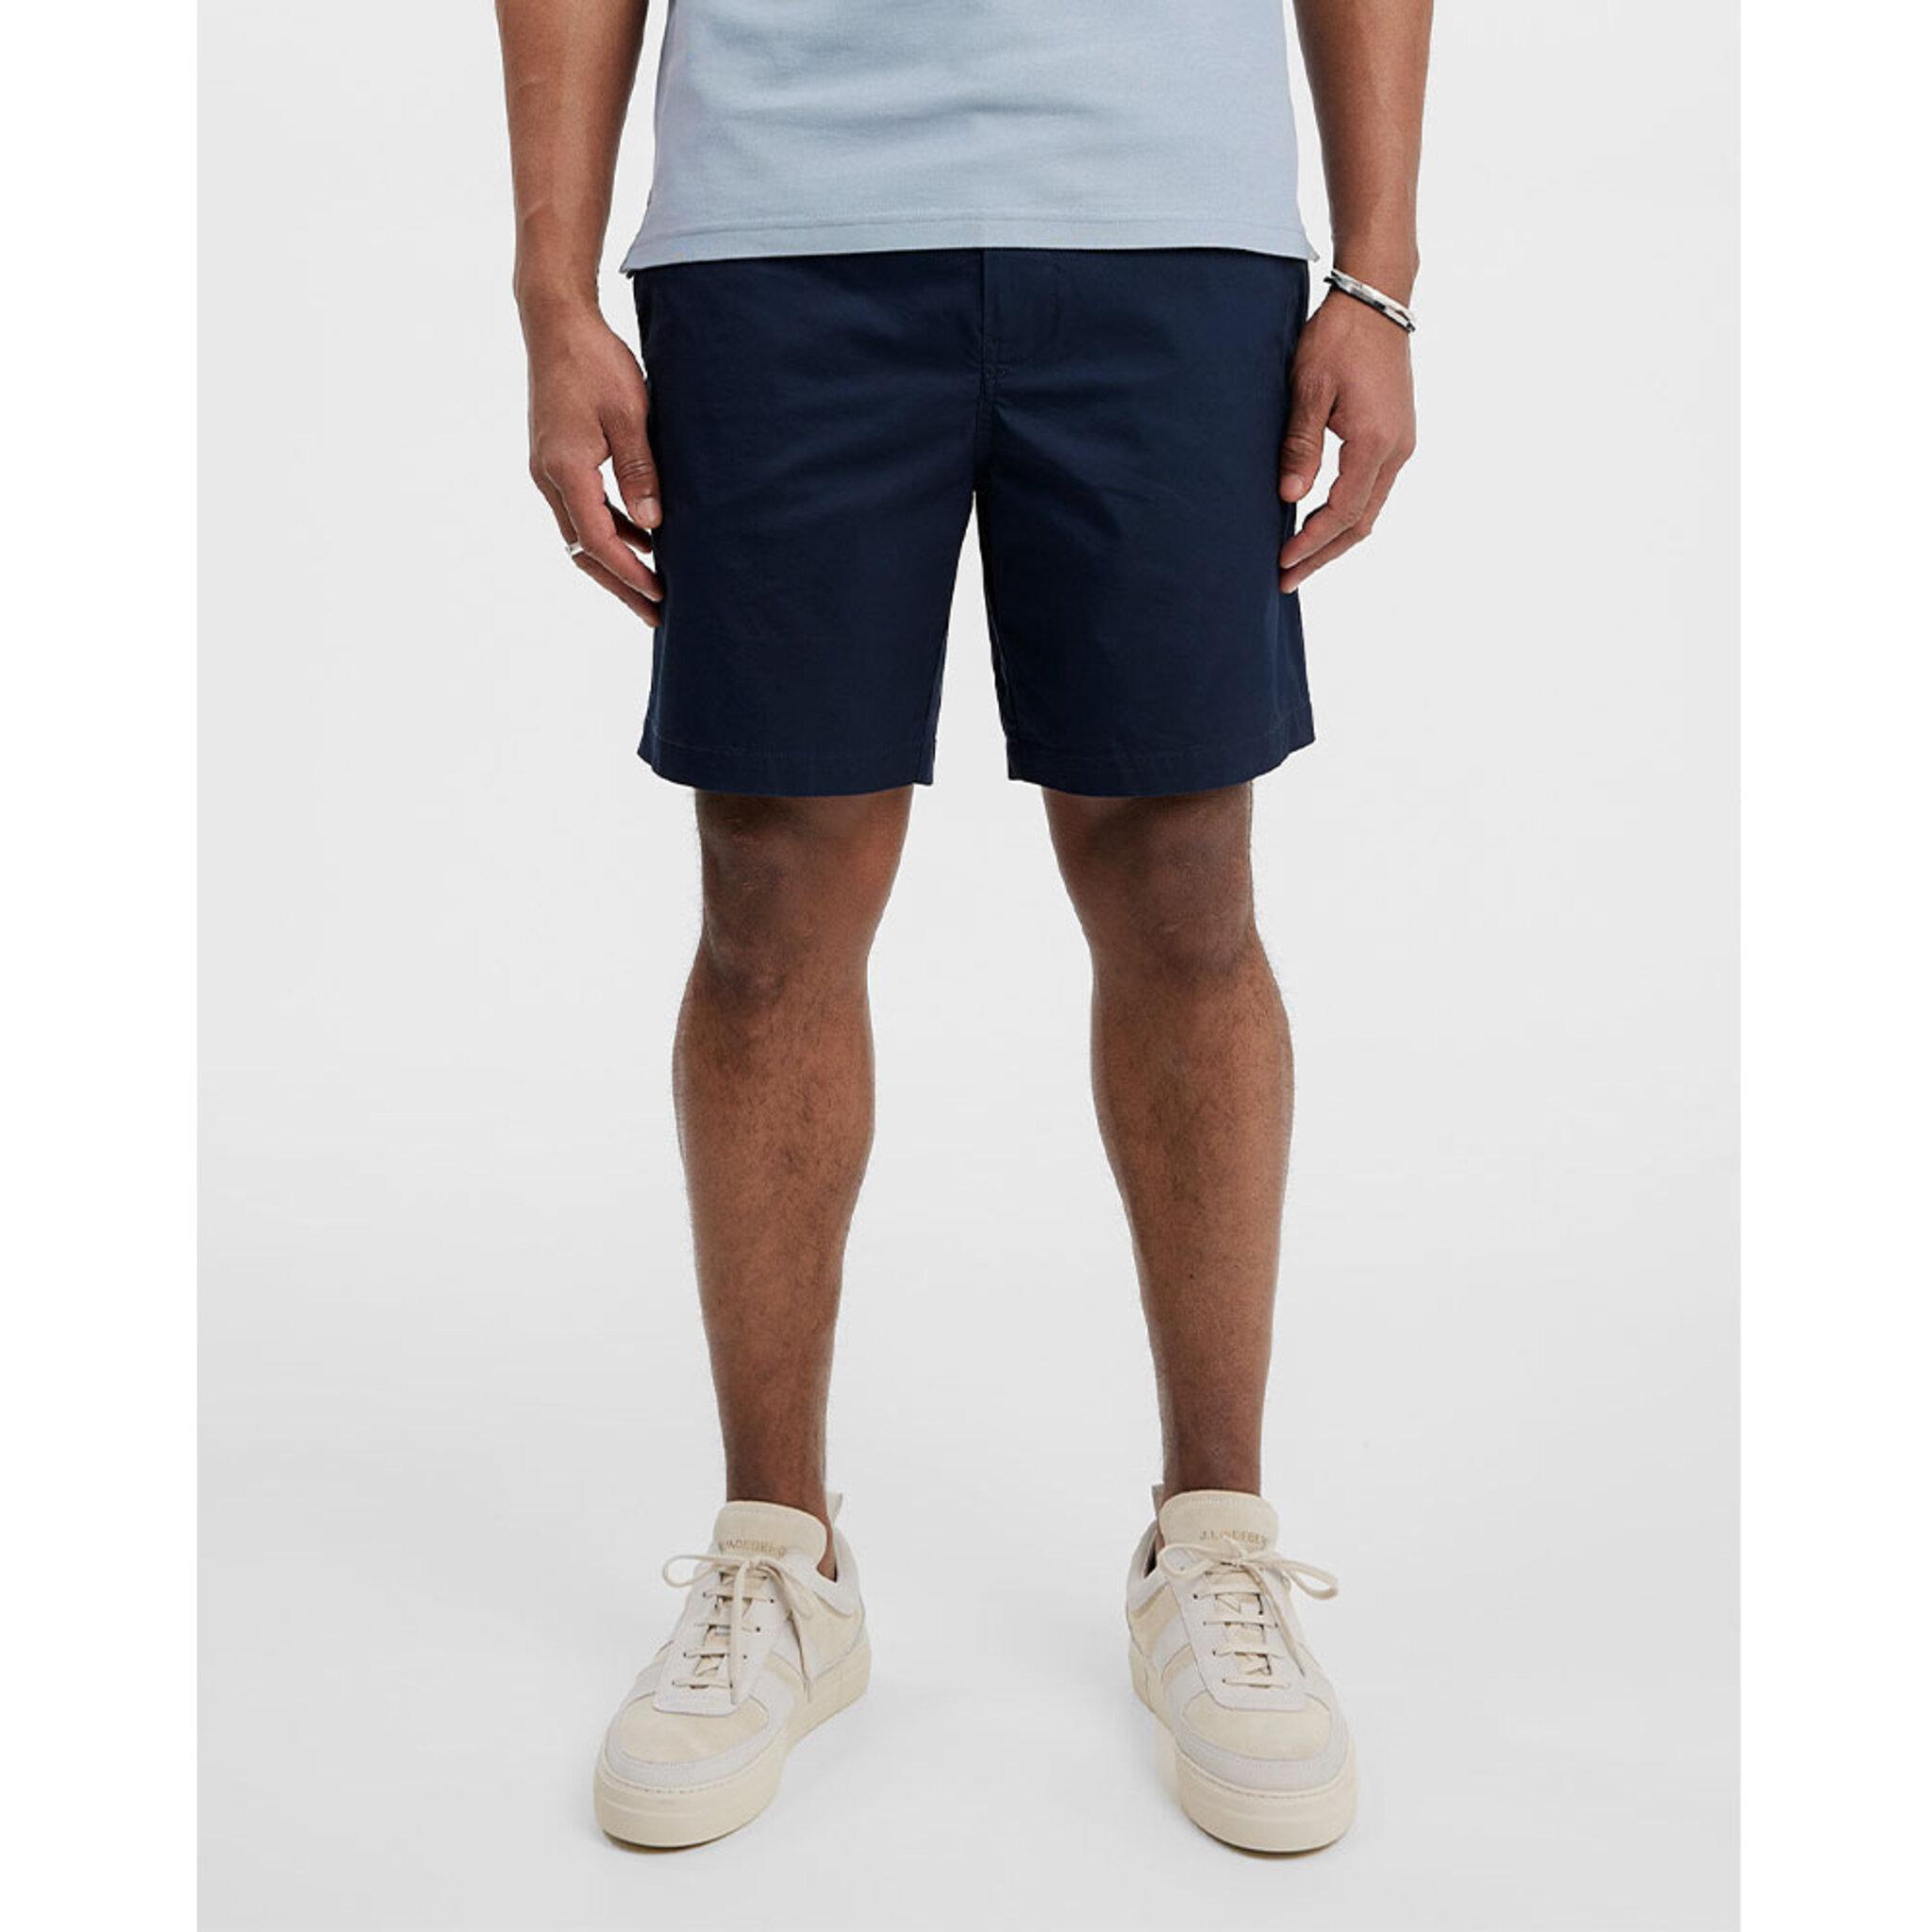 Ralf Cotton Stretch Shorts